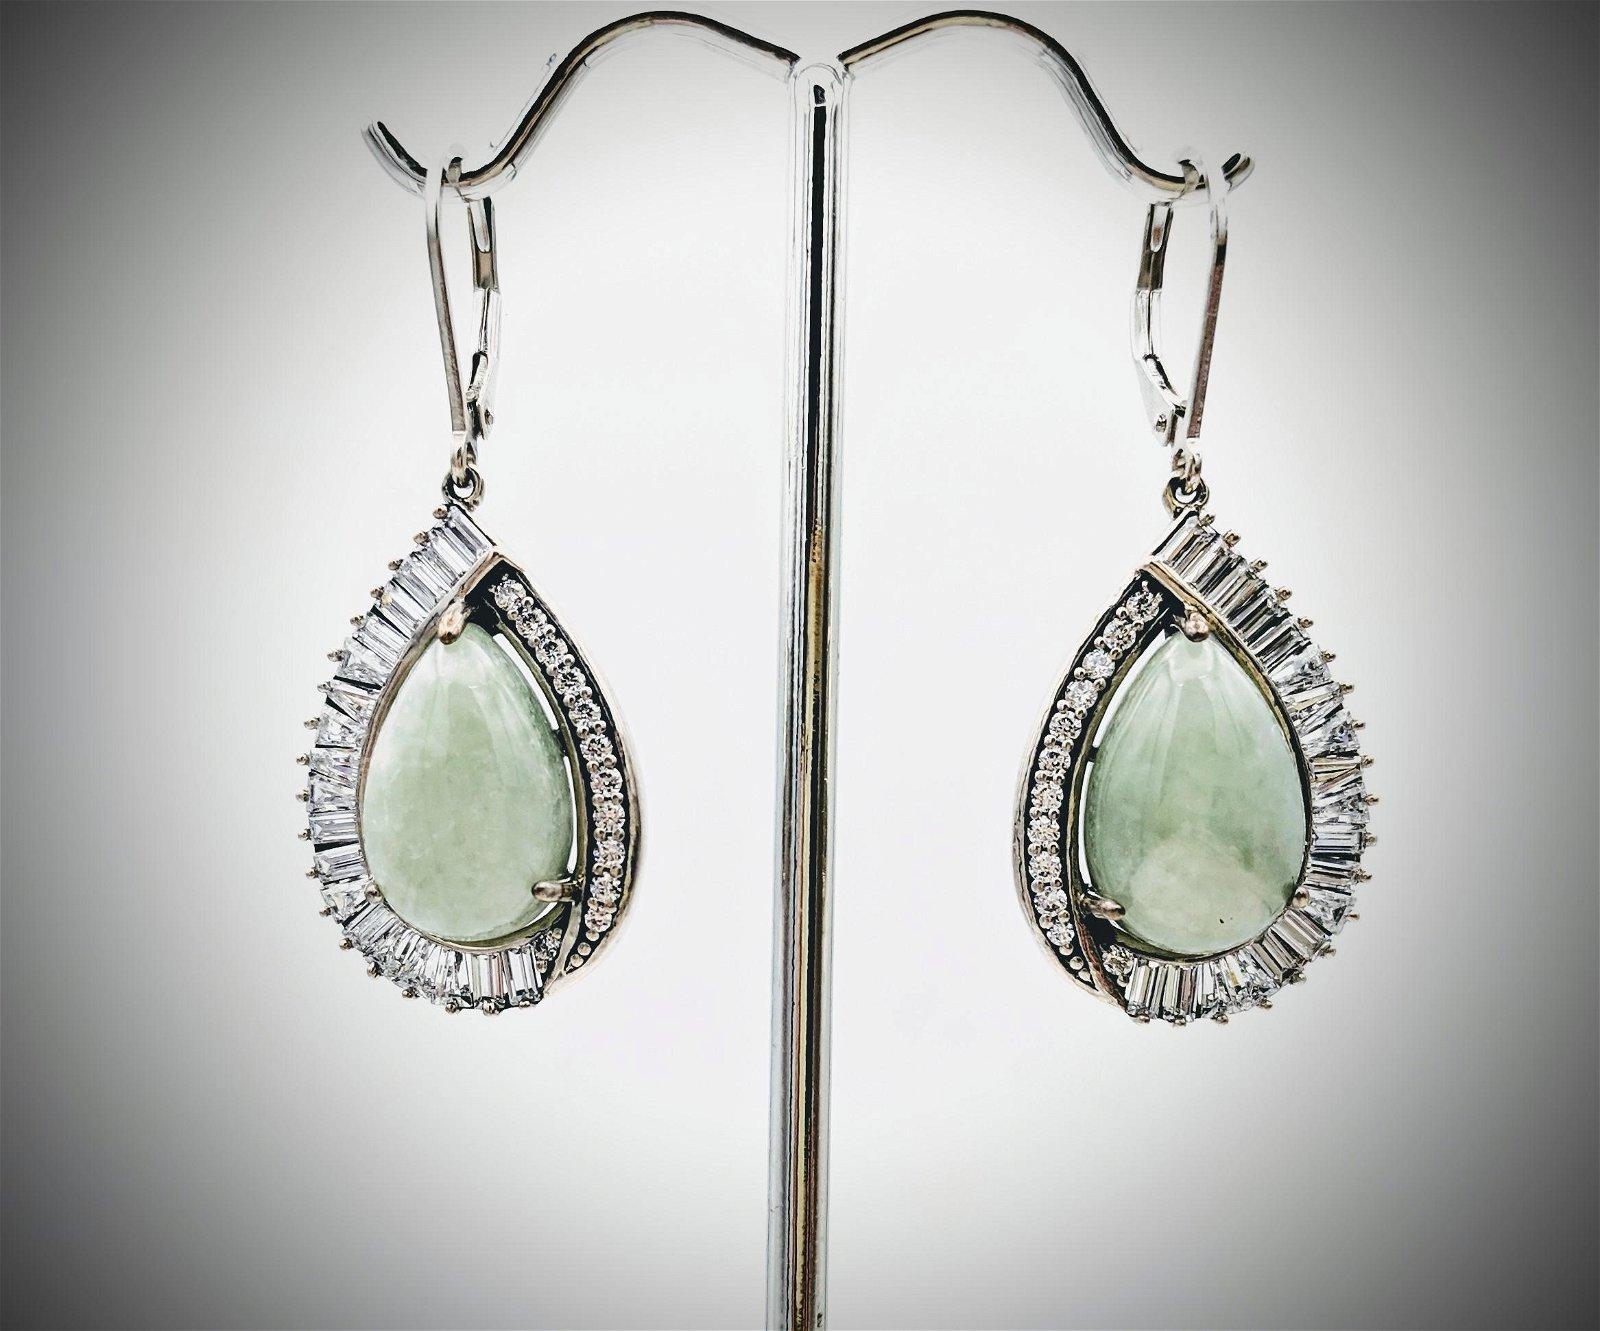 925 SS Pear Shaped Cocktail Earrings w Jade & CZs